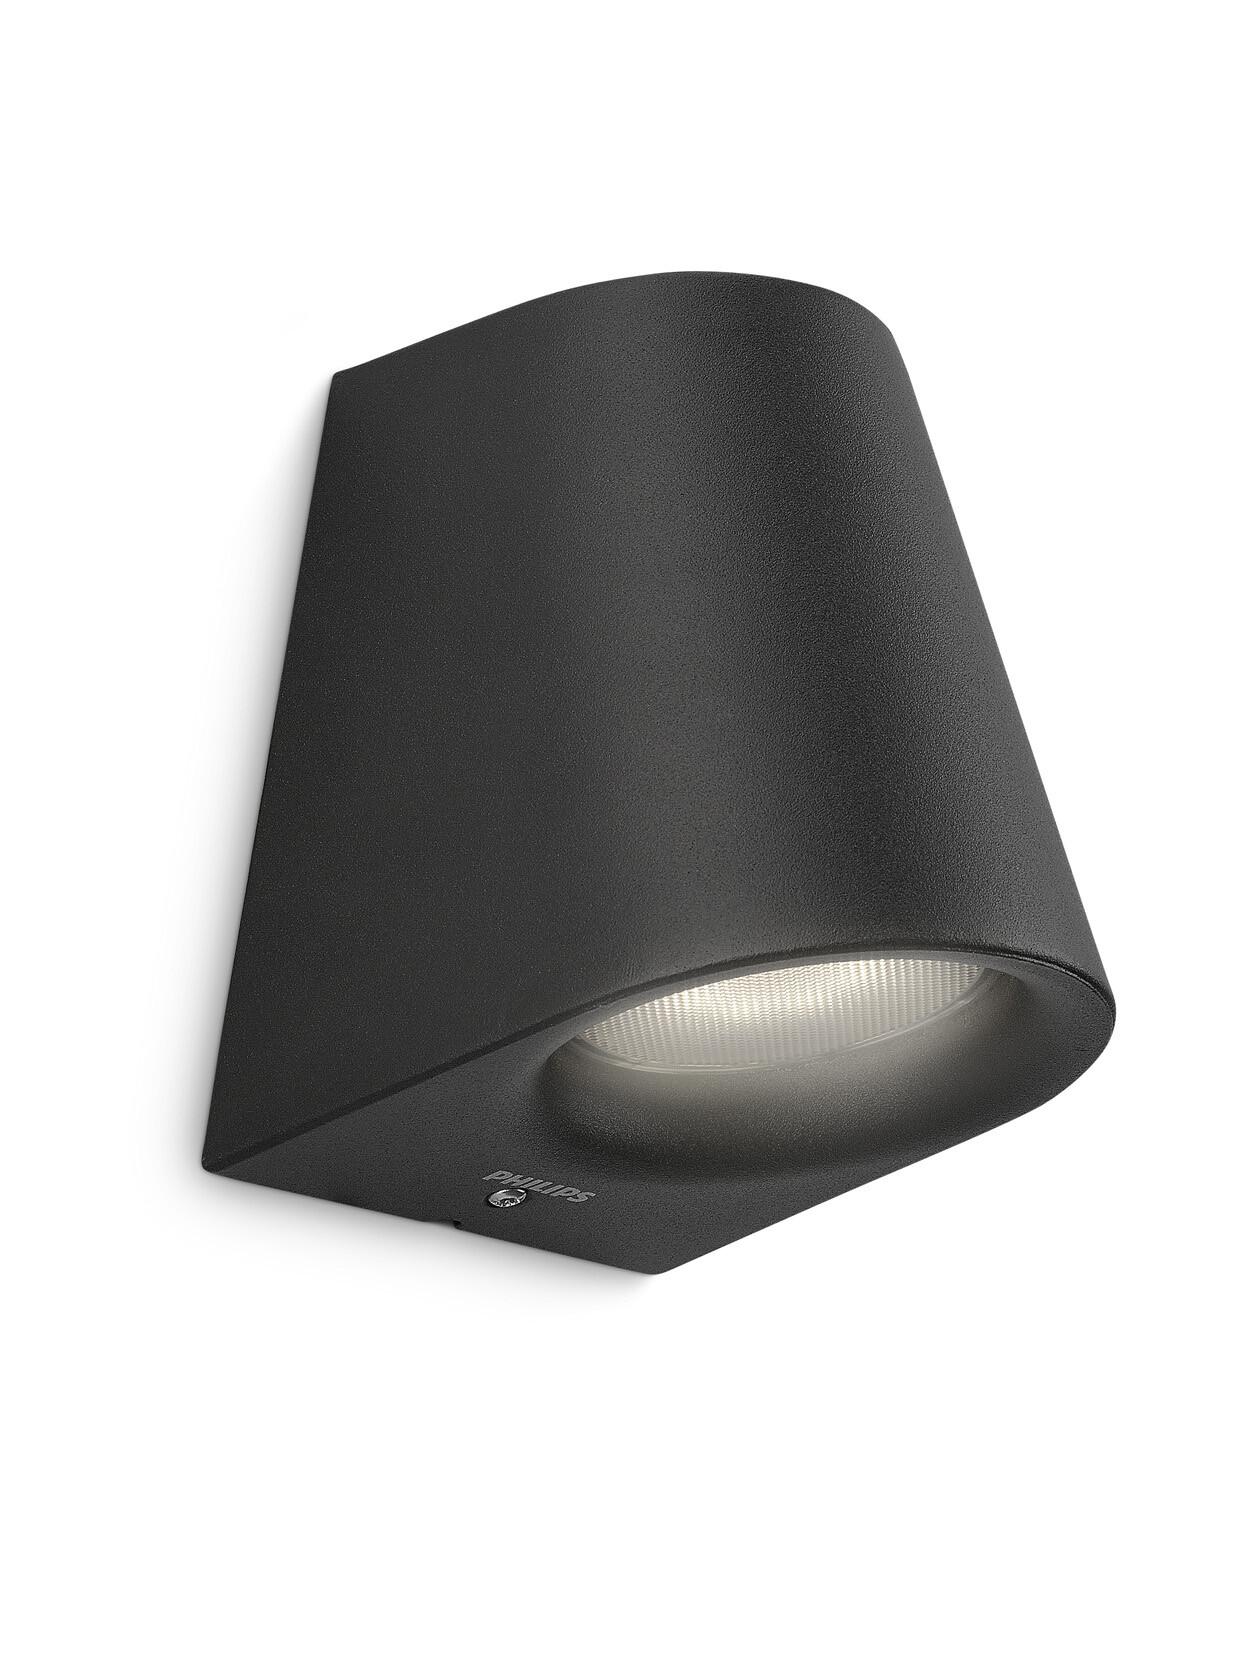 Philips VIRGA Wandlamp LED 1x4W/270lm Zwart